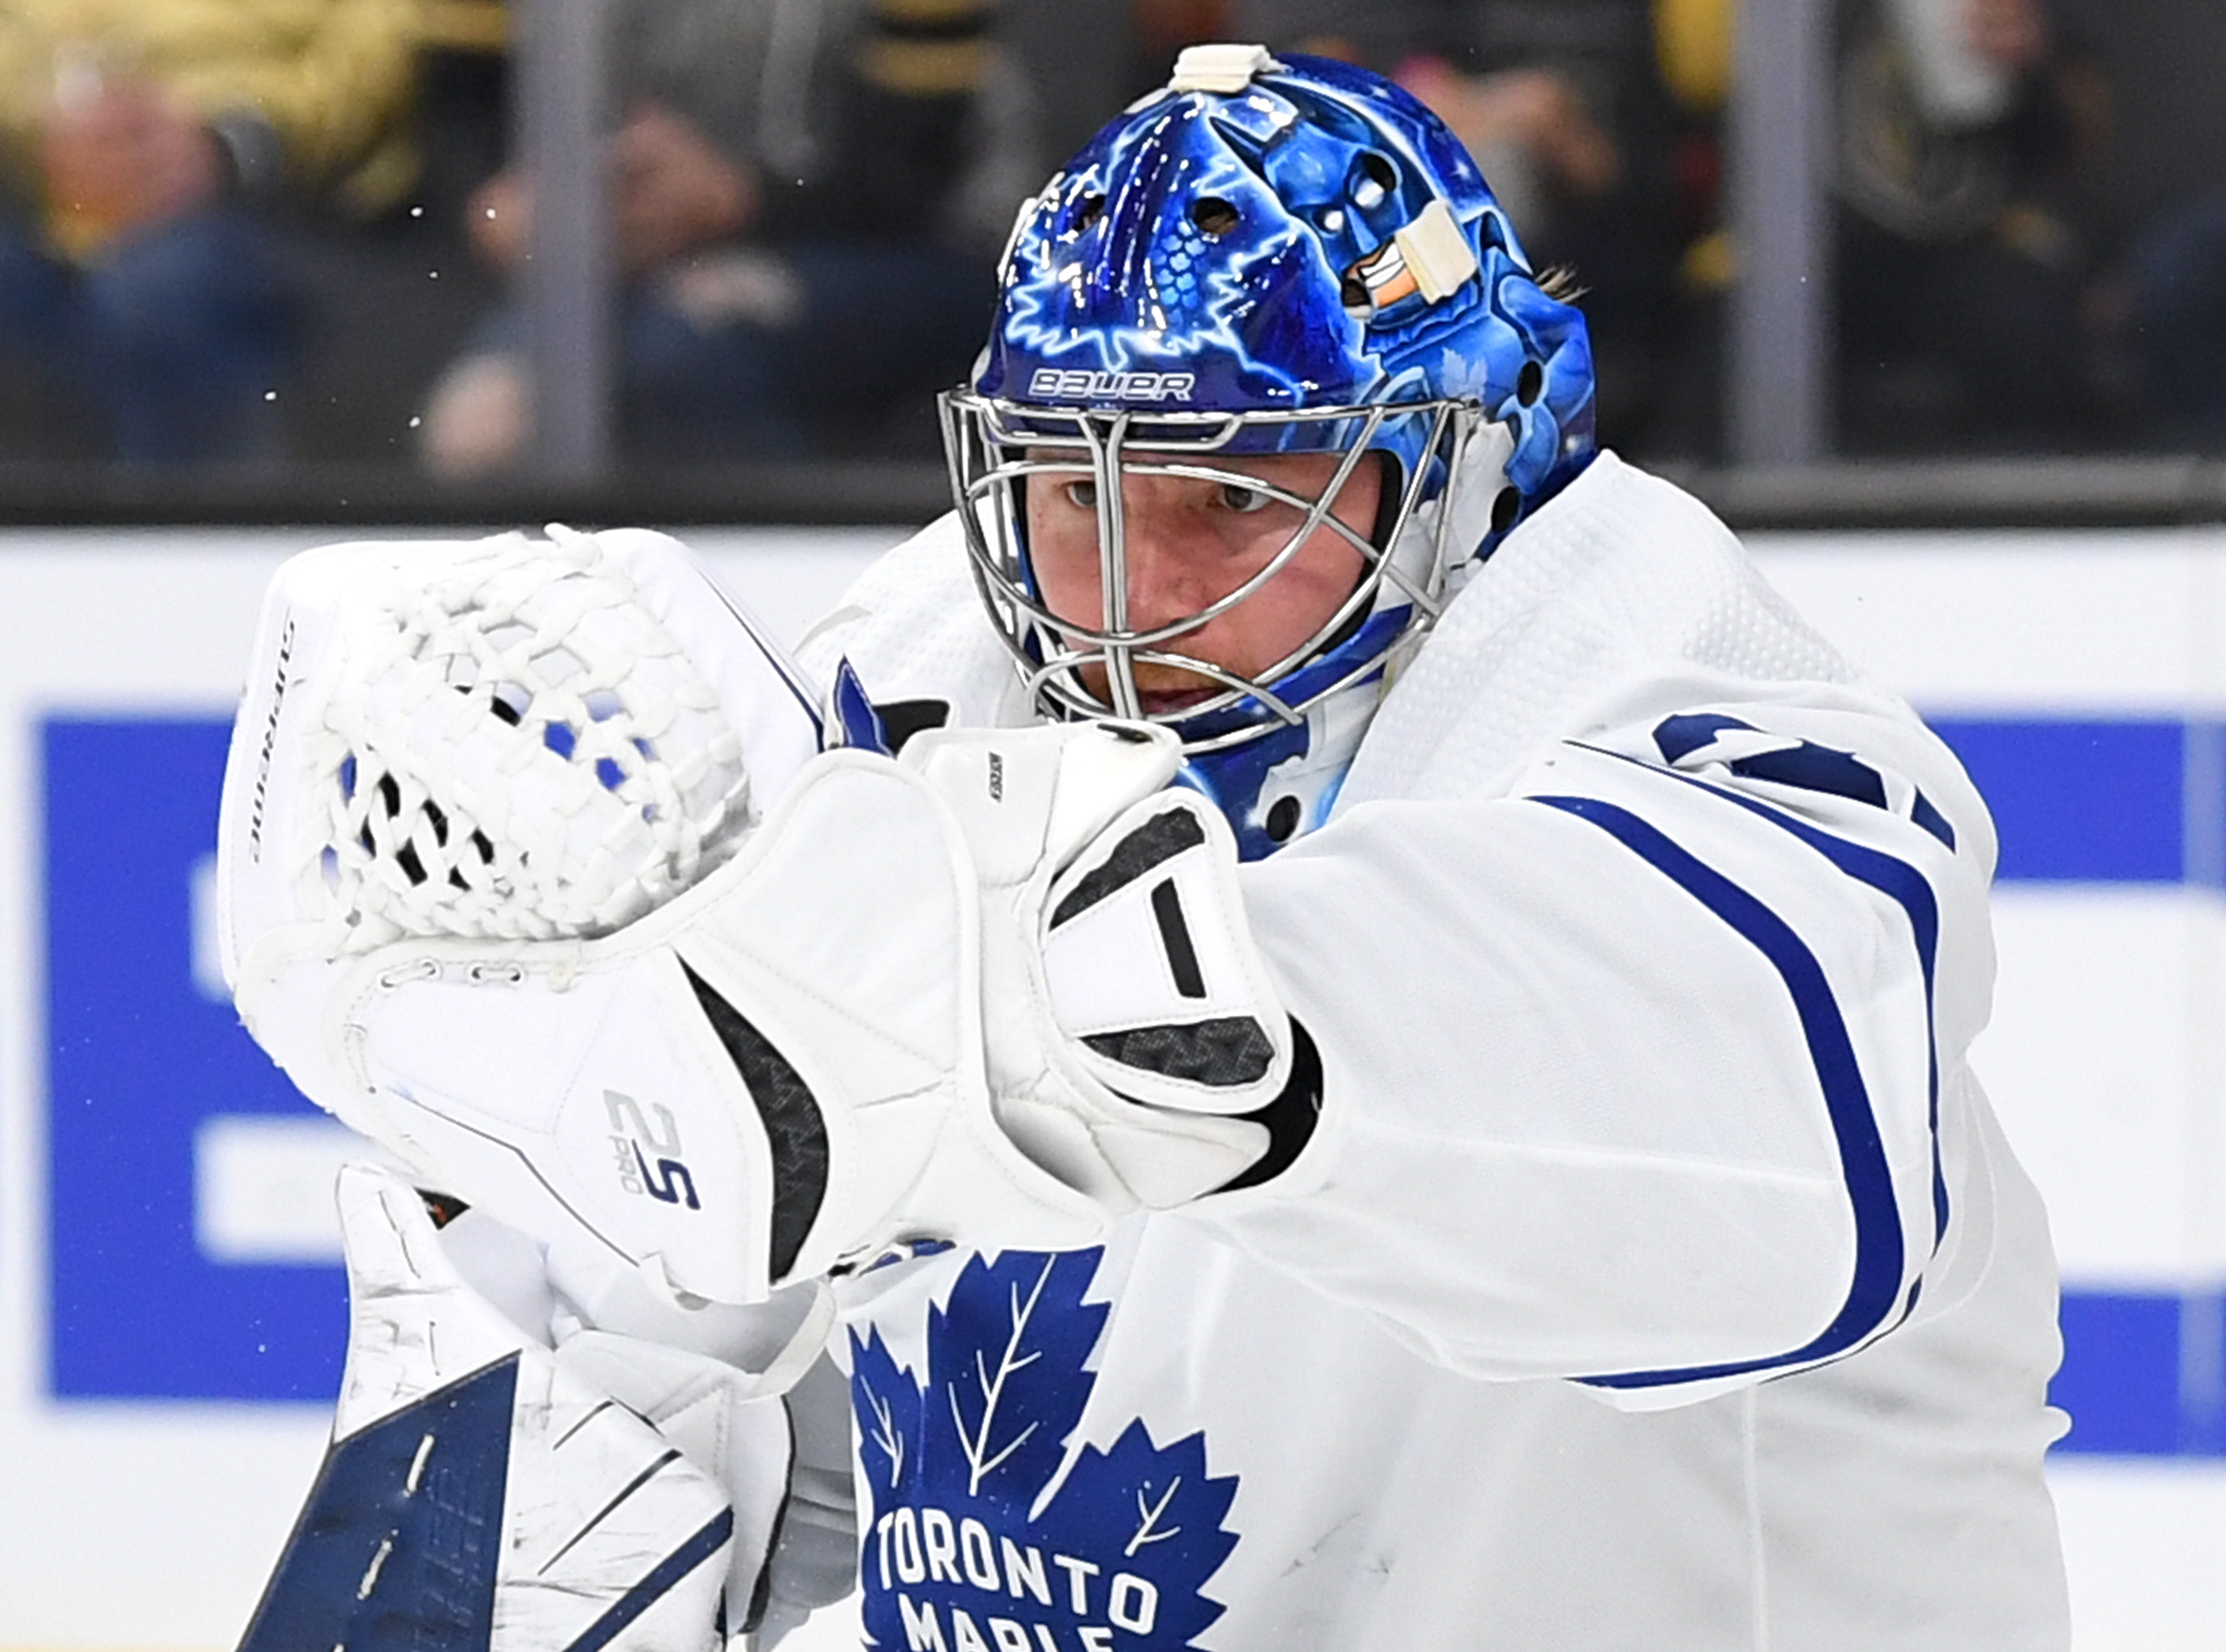 Maple Leafs goaltender Frederik Andersen records 17th career shutout